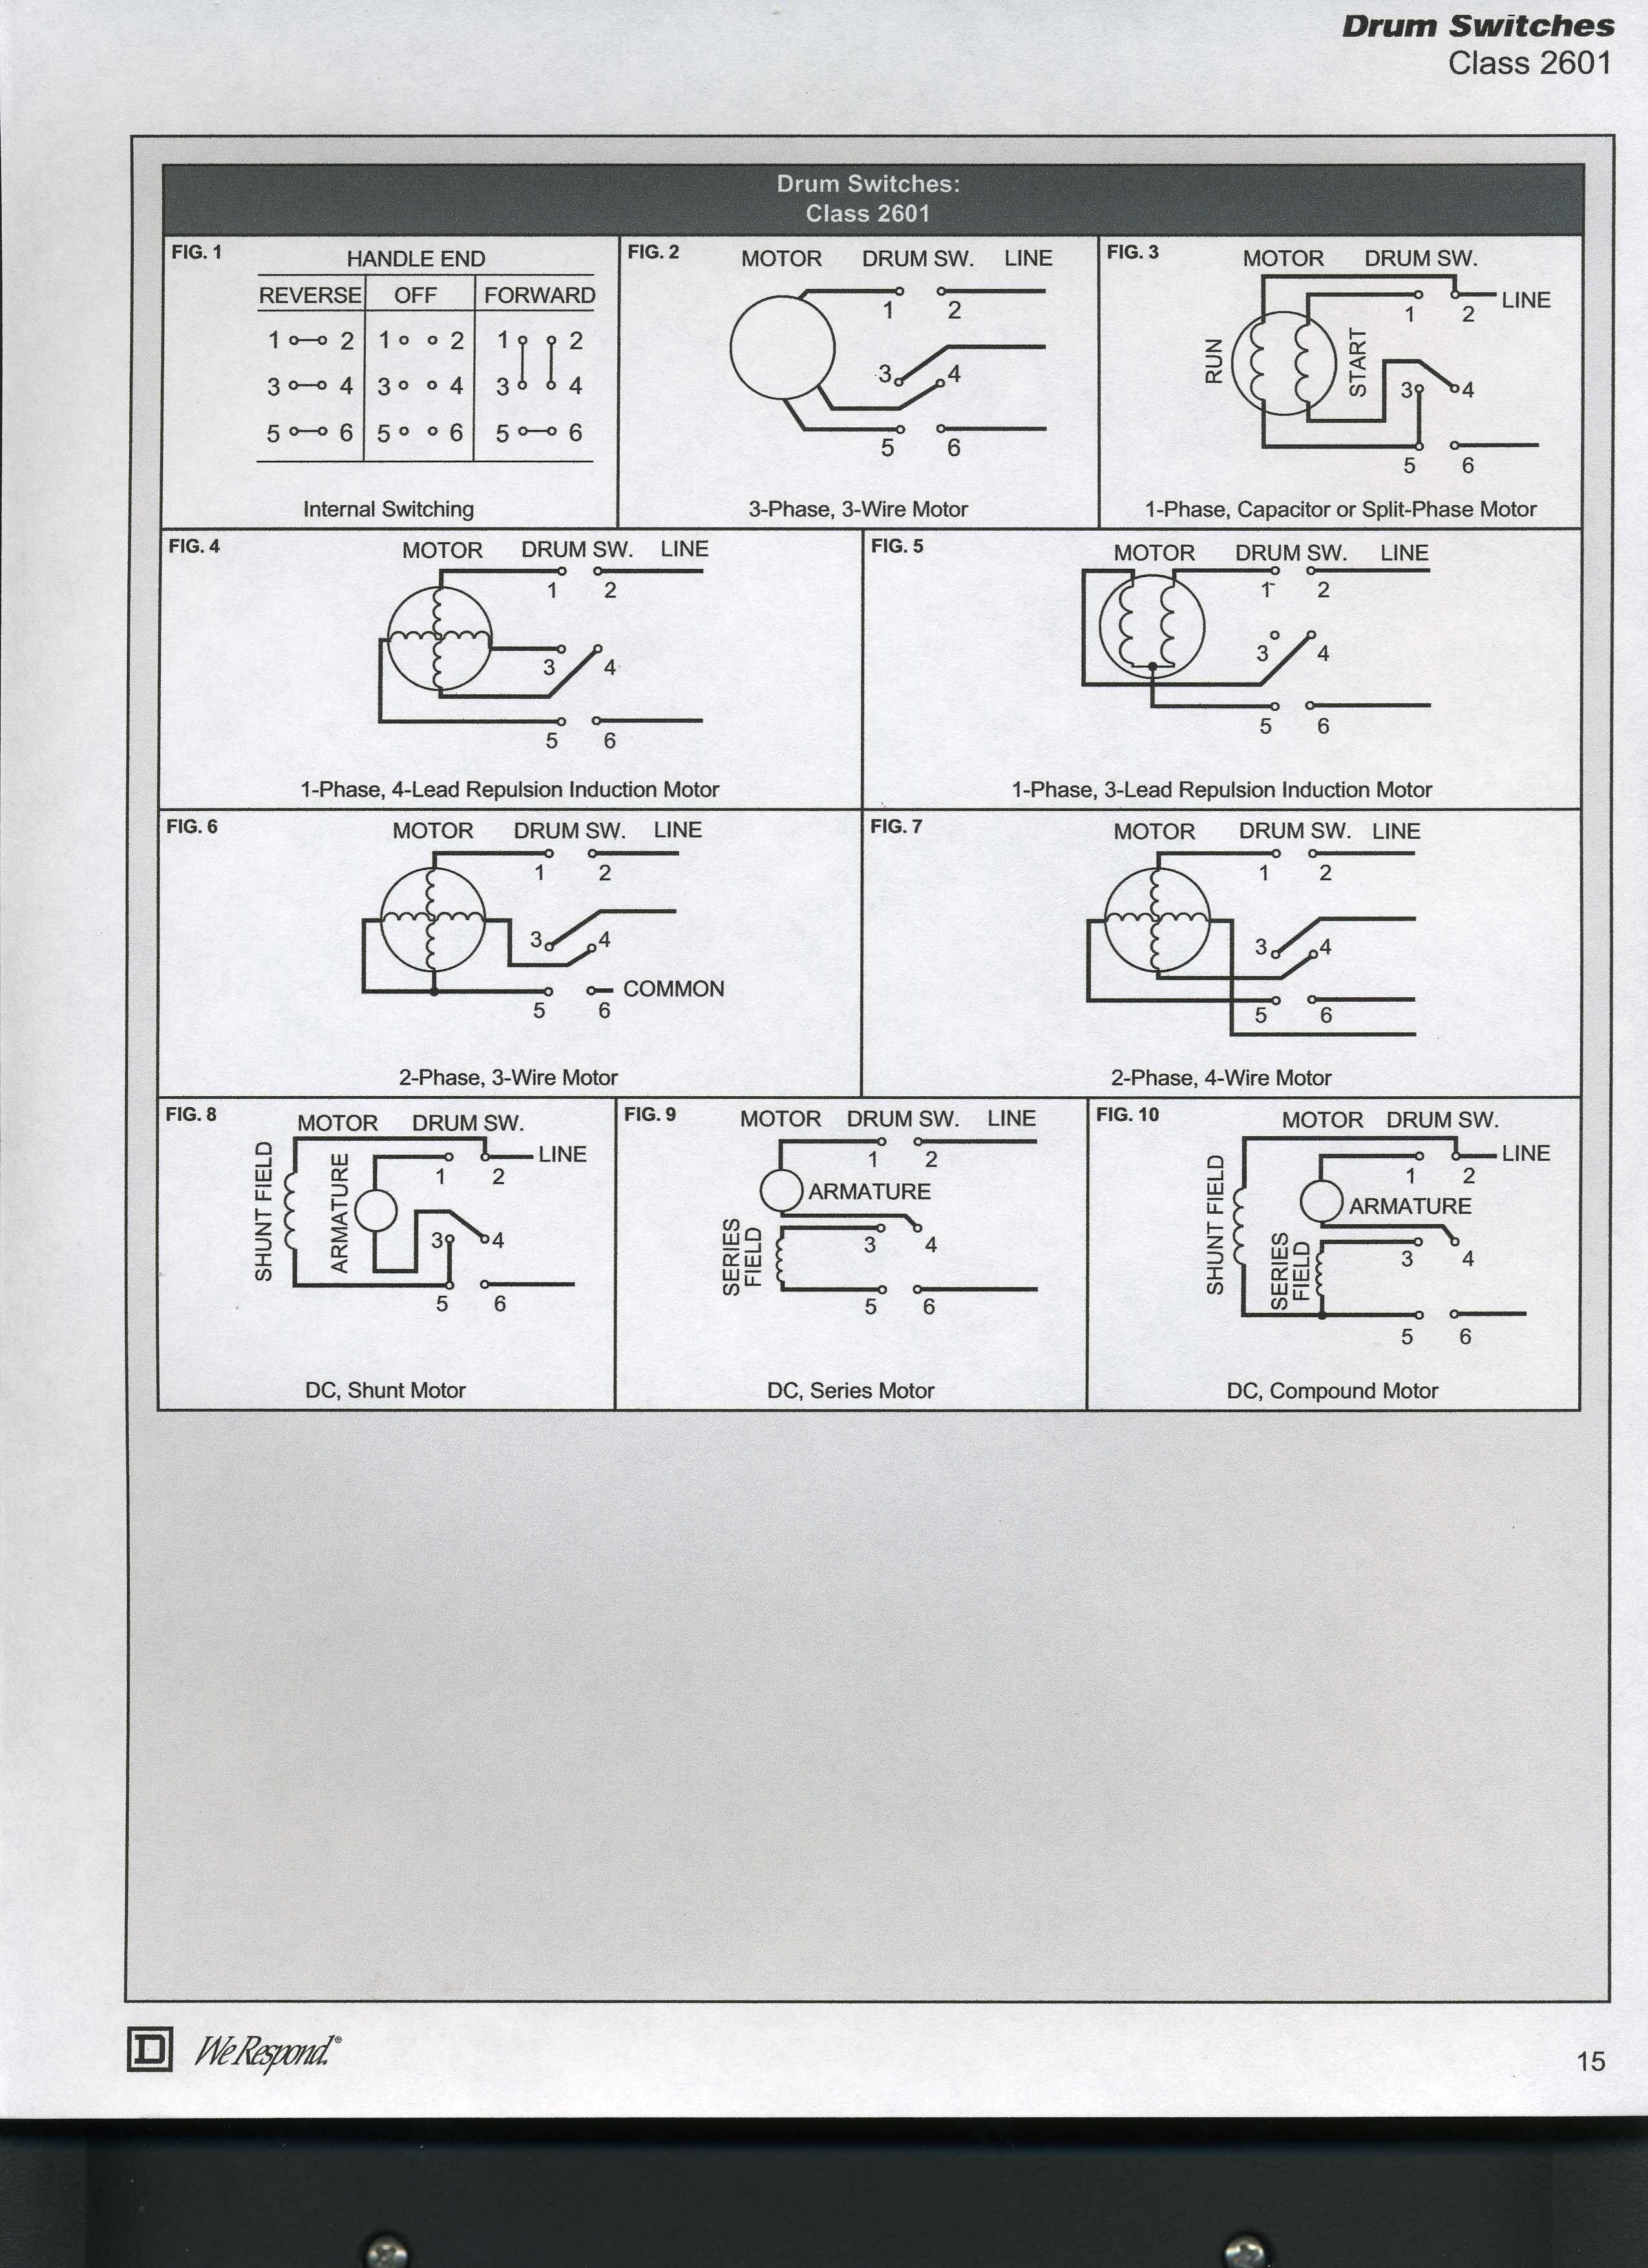 medium resolution of unique wiring diagram baldor electric motor diagram diagramsampleunique wiring diagram baldor electric motor diagram diagramsample diagramtemplate